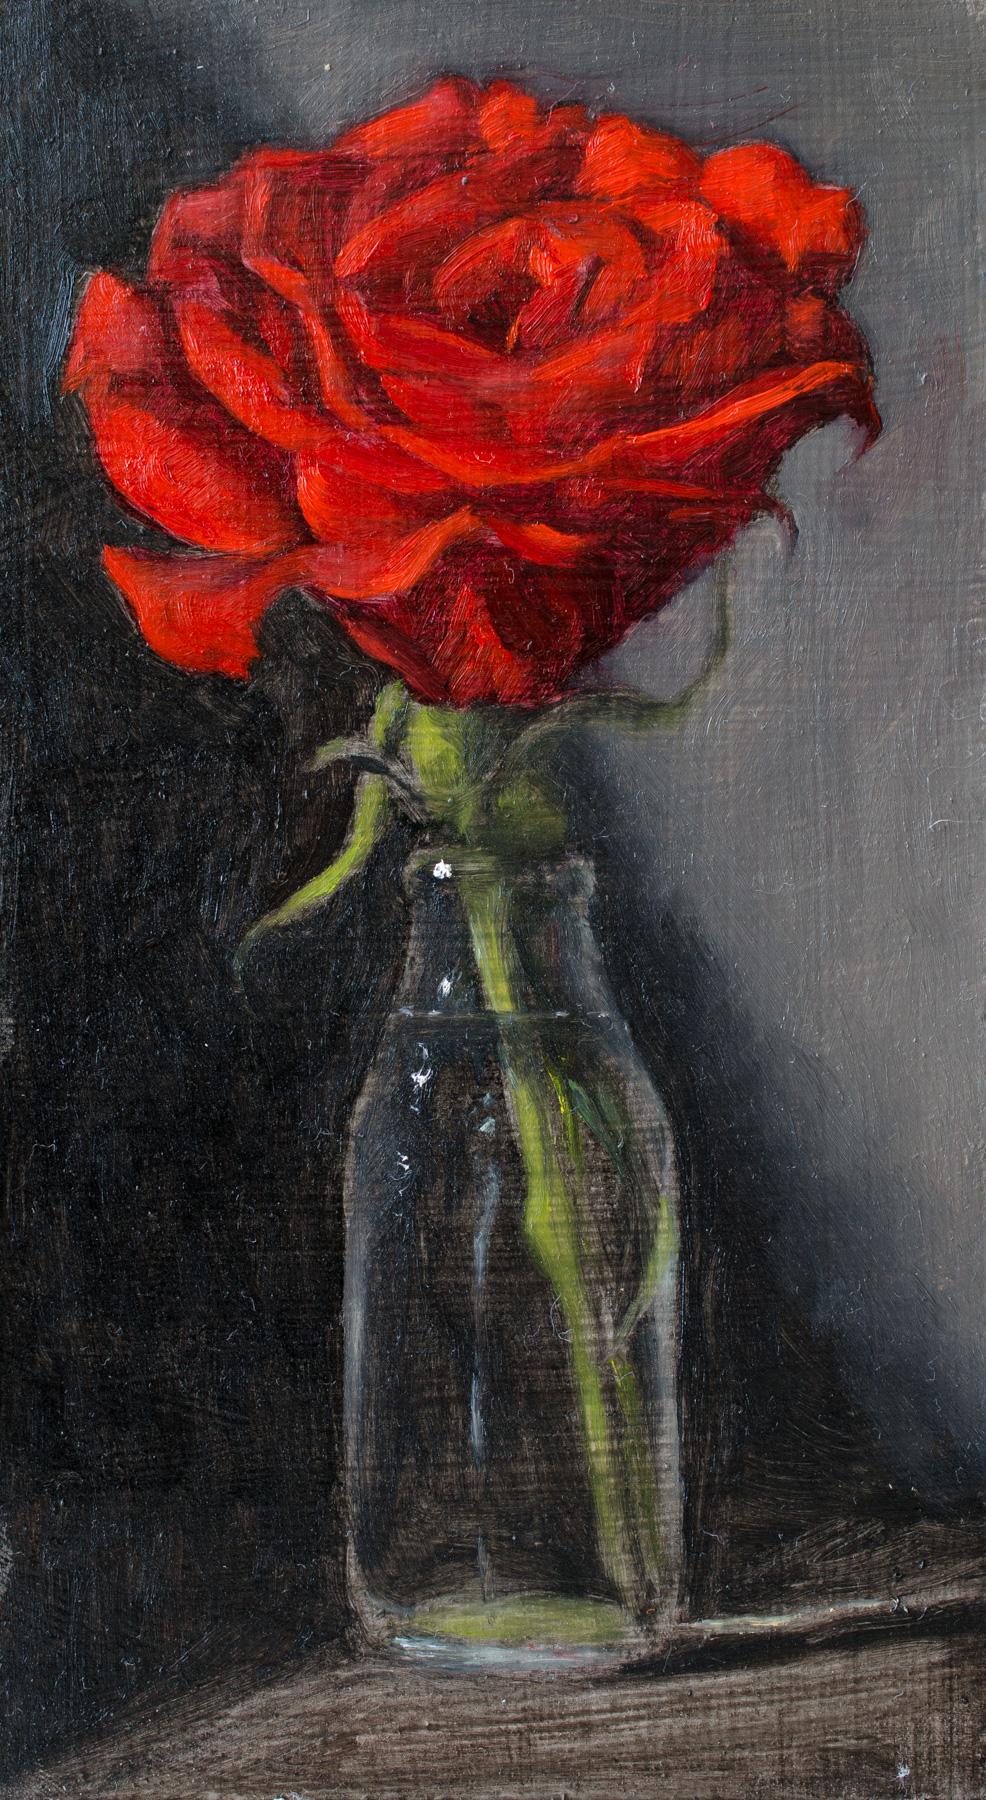 """Unfolding Rose"" oil on wood panel, 4x7''"